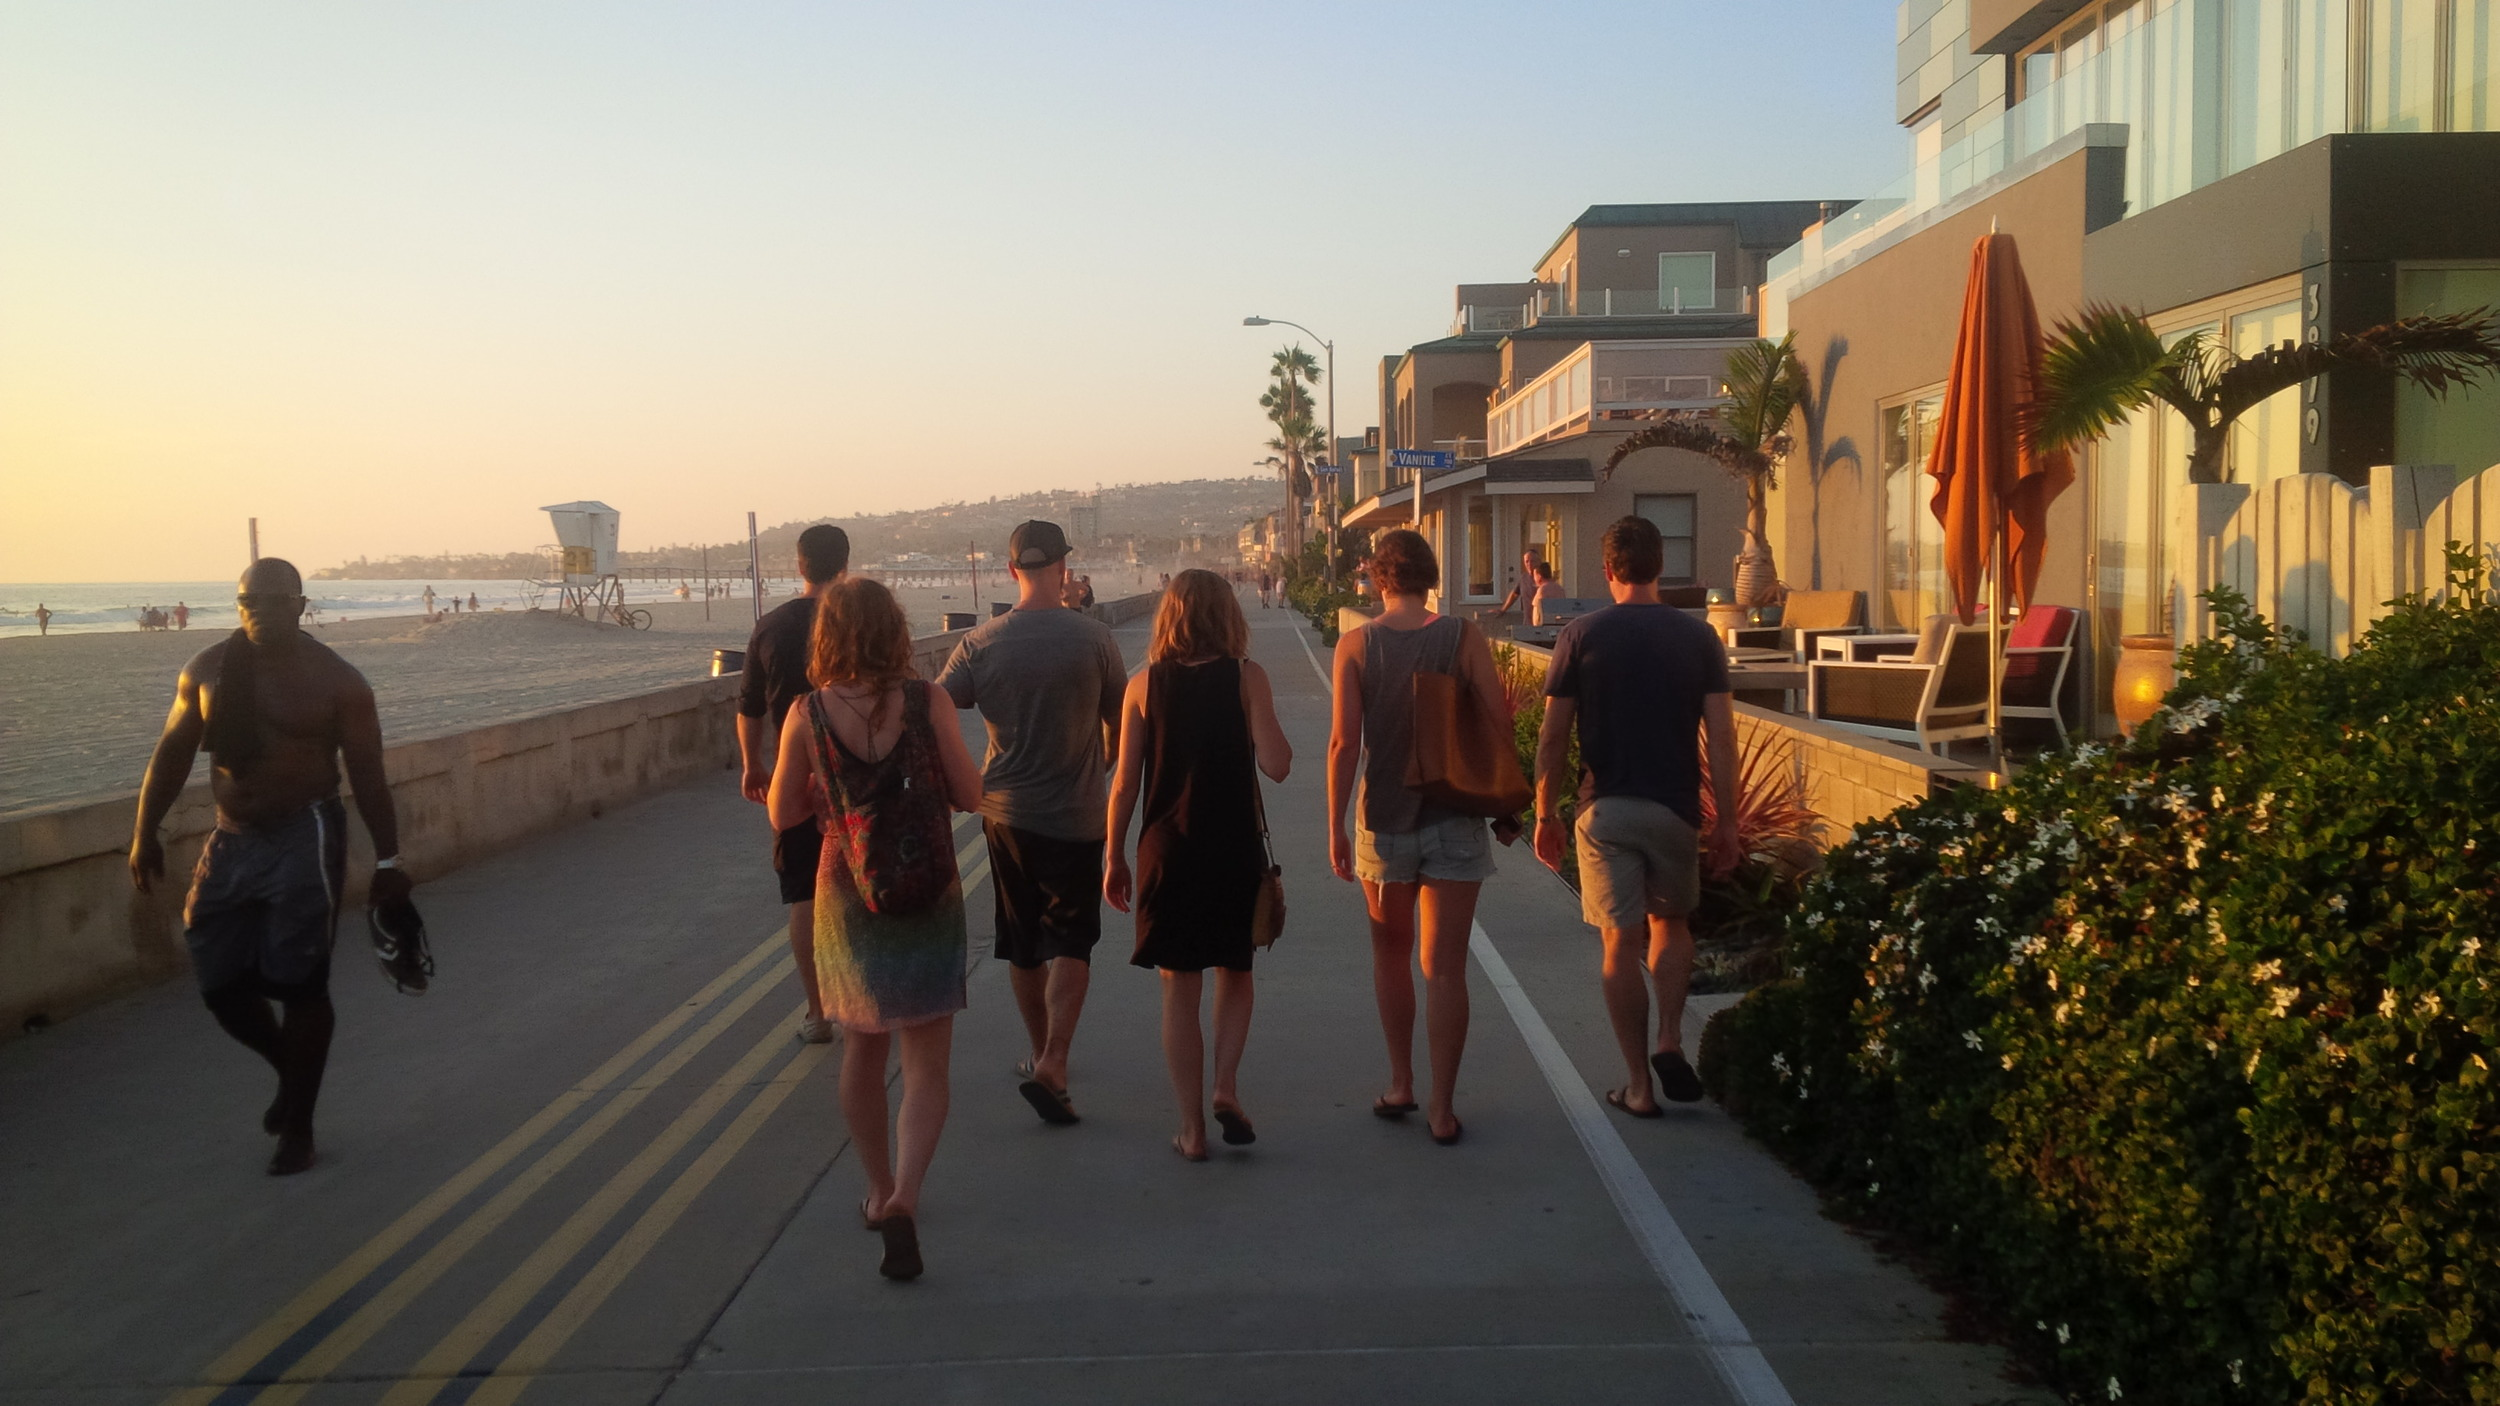 Just taking a stroll down the esplanade in San Diego.